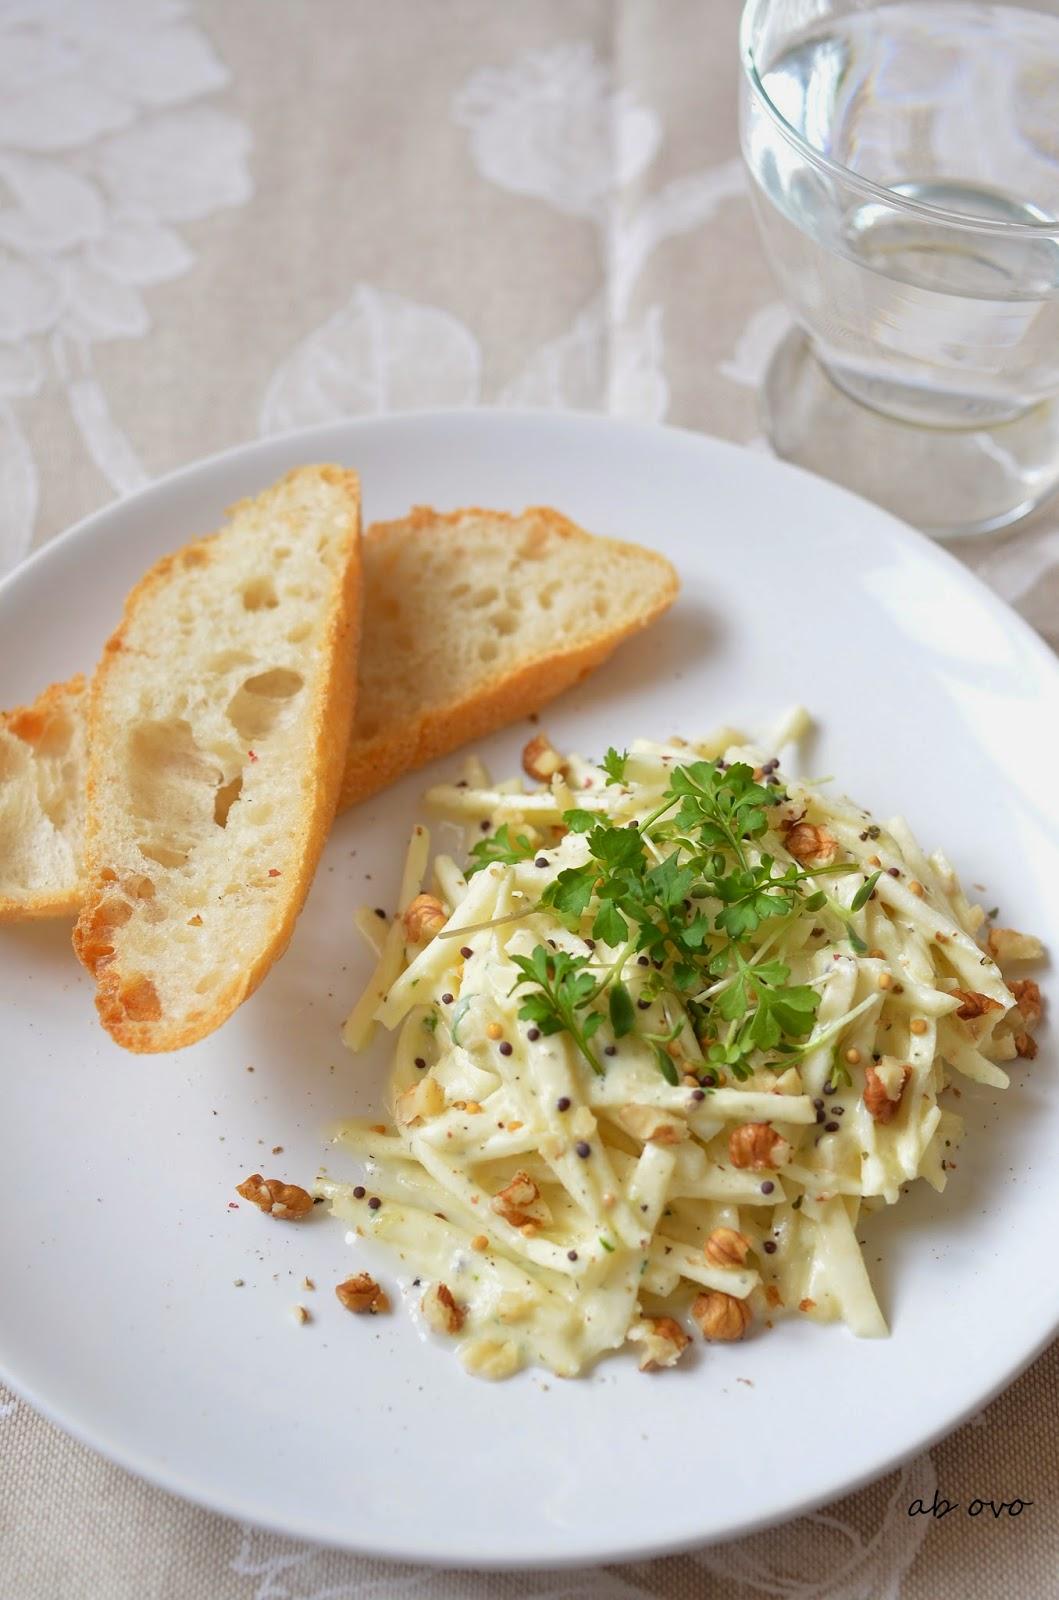 Insalata-di-sedano-rapa-e-noci-Céleri-rémoulade